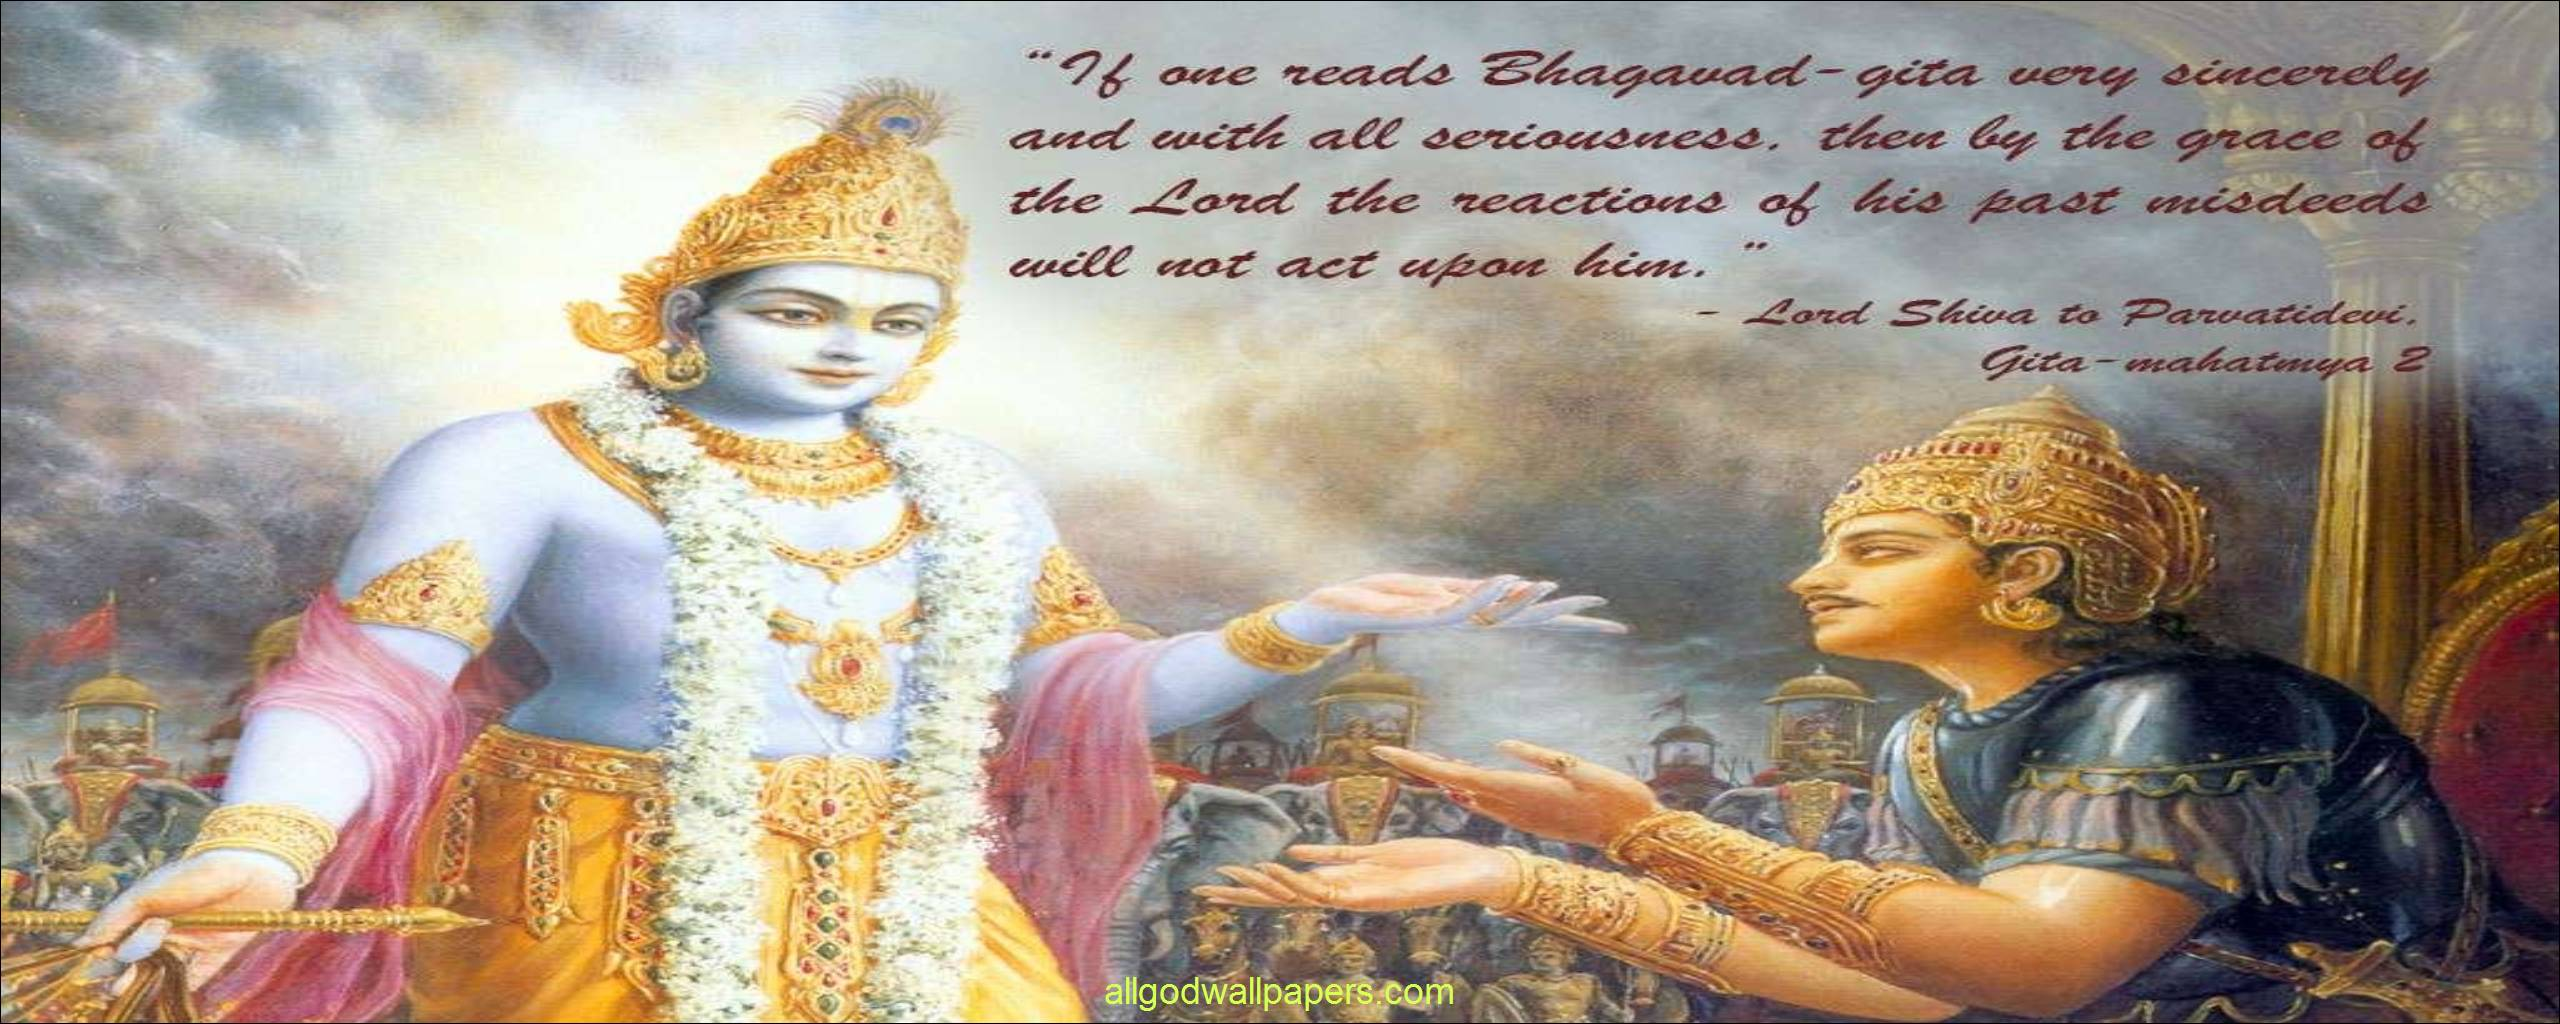 Bhagavad Gita Wallpaper 2560x1024